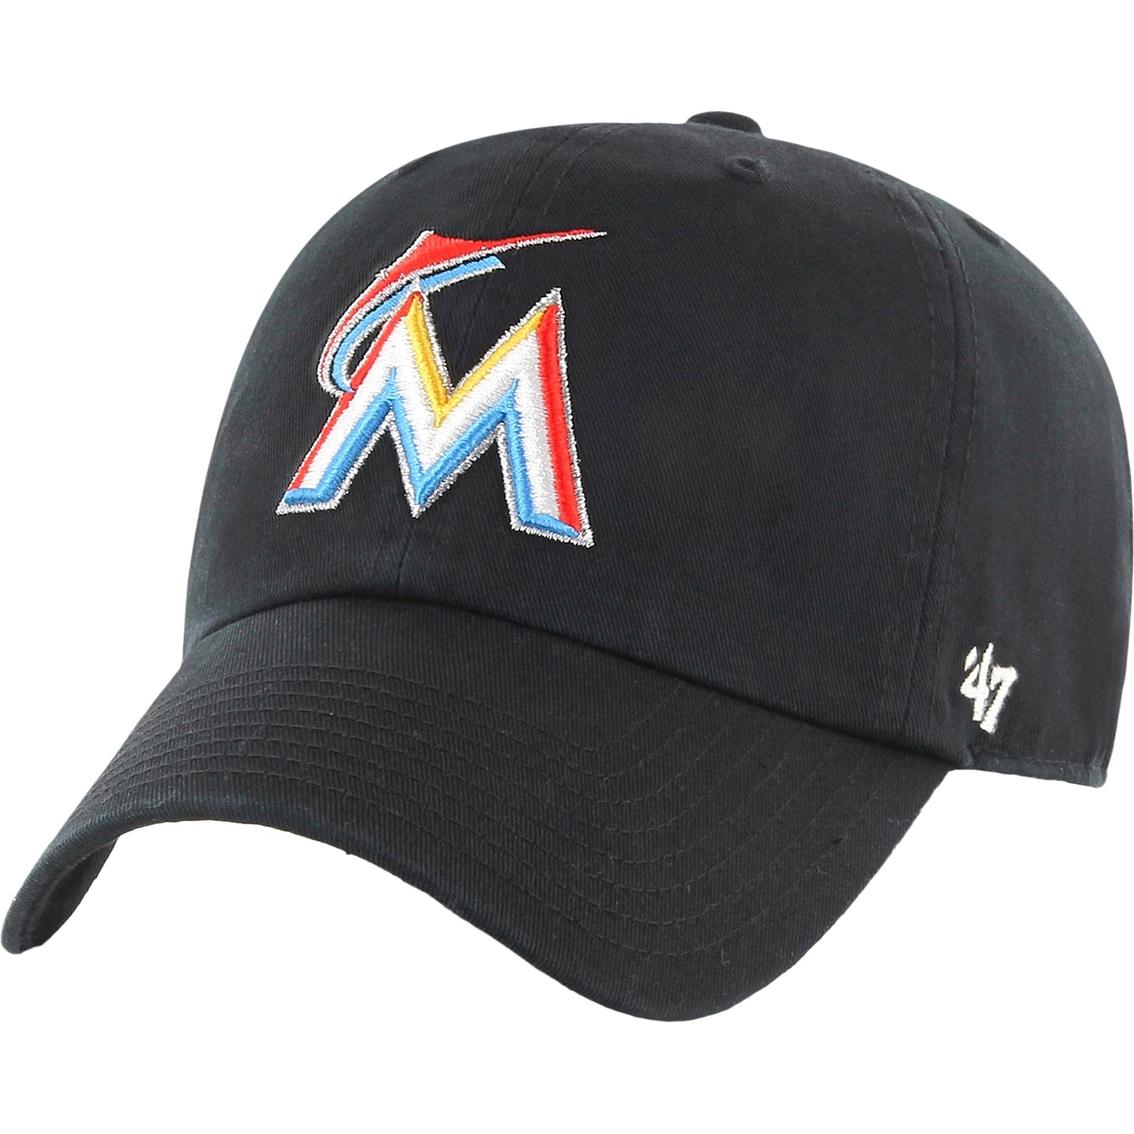 47 brand mlb miami marlins s clean up baseball cap